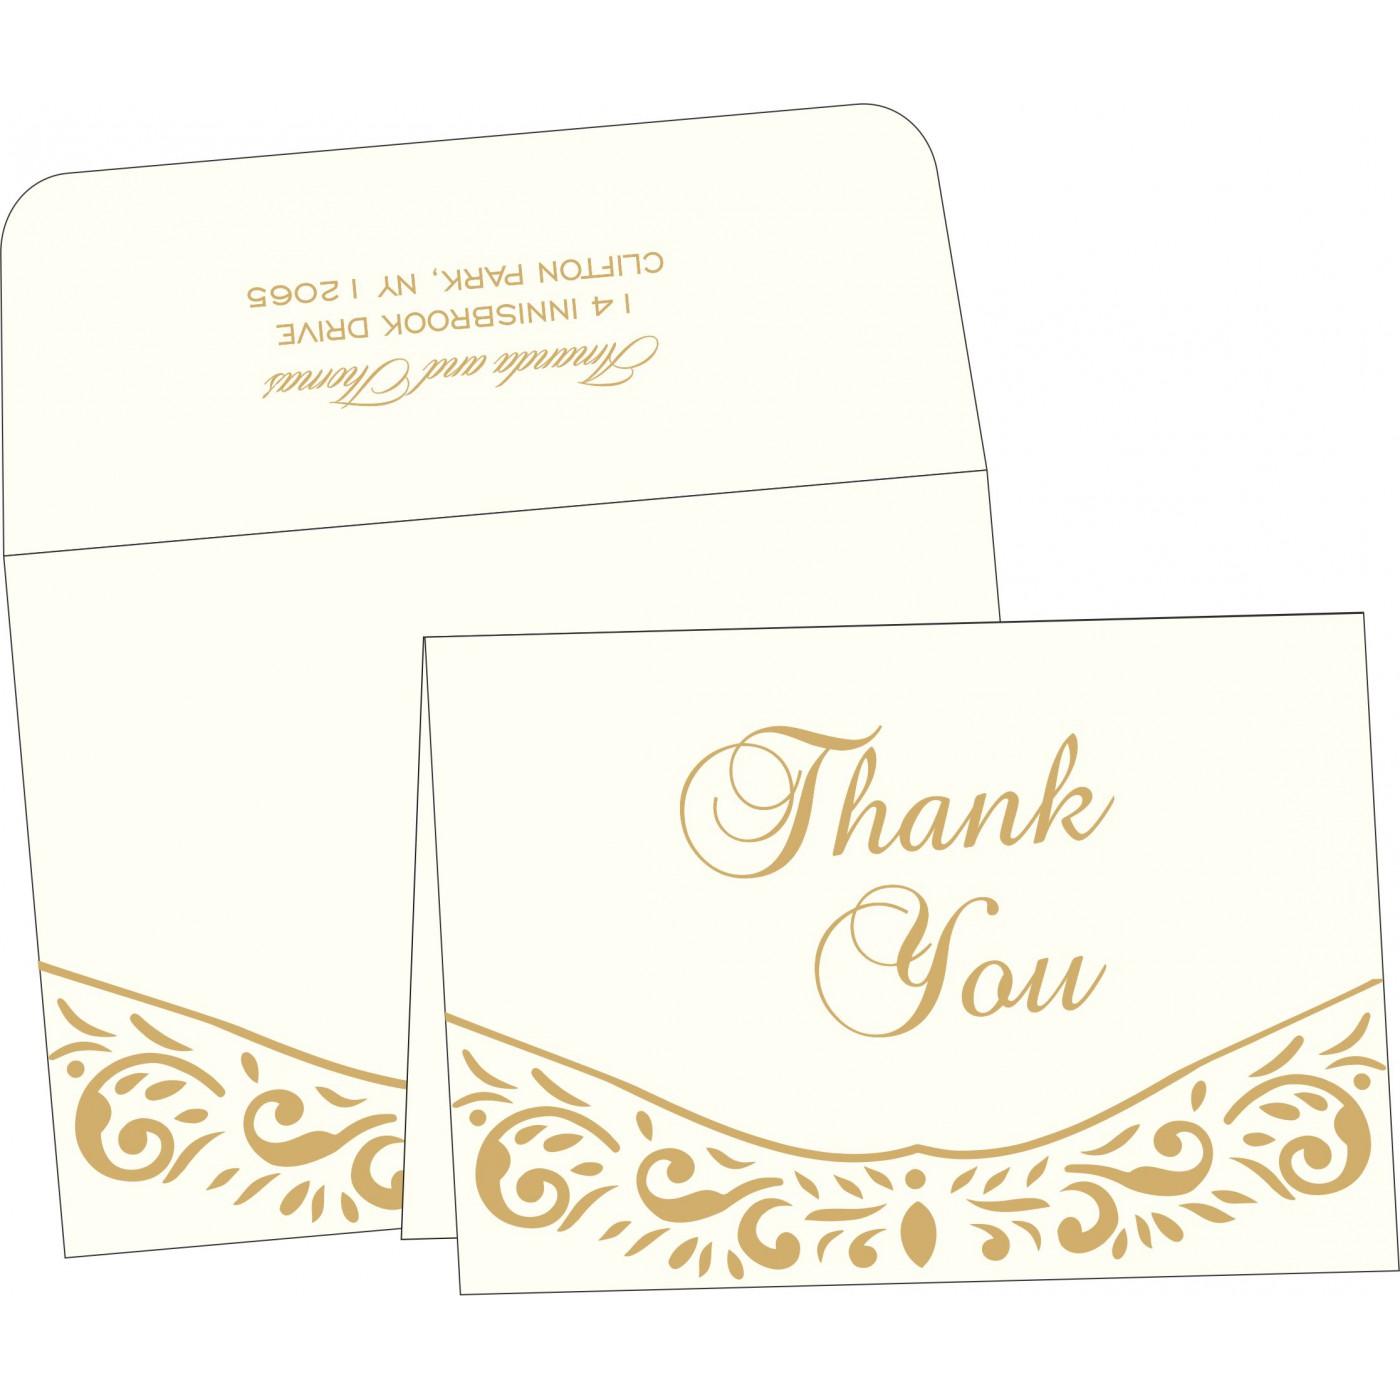 Thank You Cards : TYC-1367 - 123WeddingCards